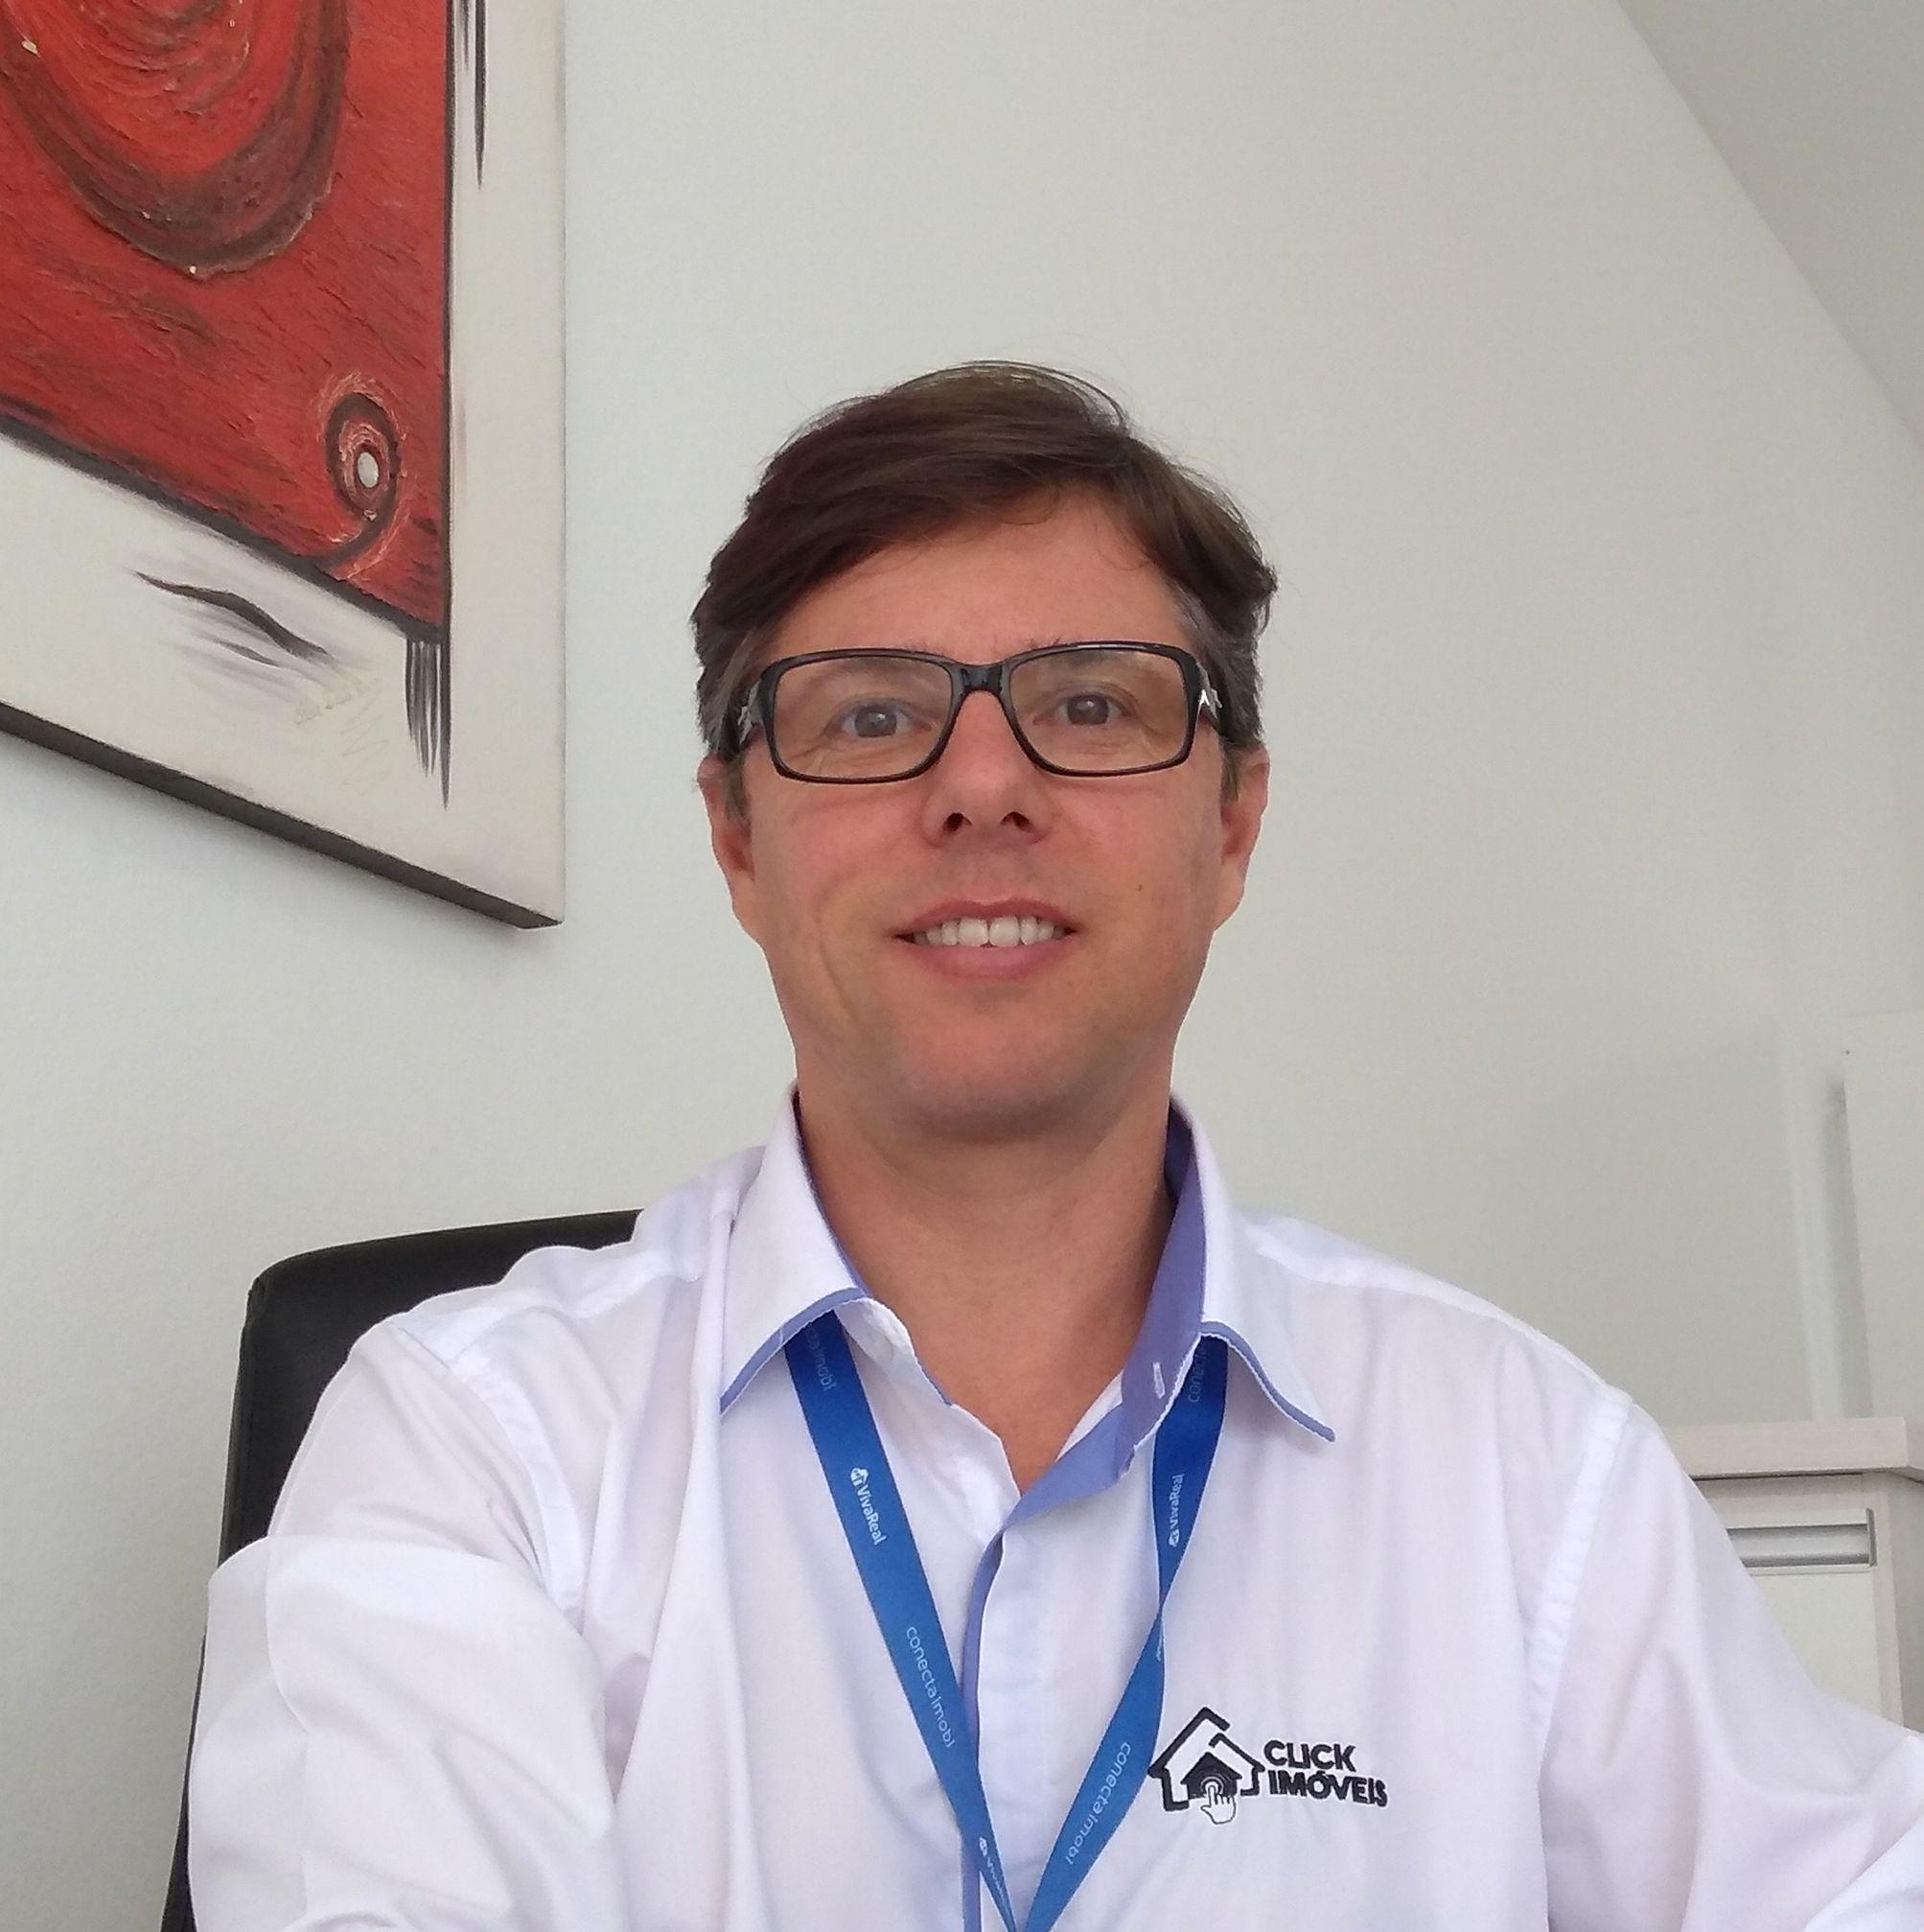 Marco Aurélio Nejedlo